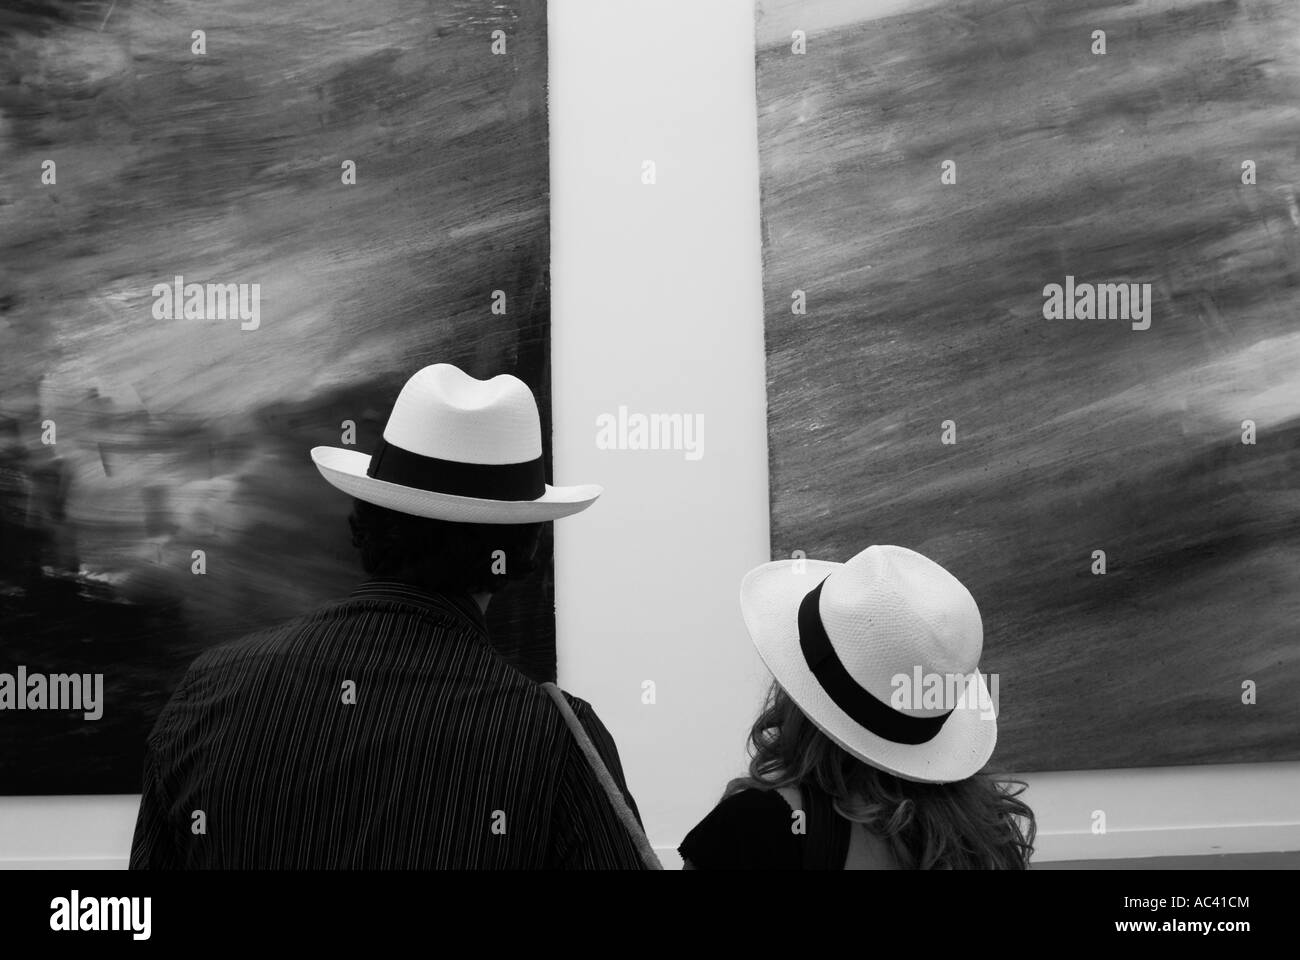 Kunstausstellung Stockbild